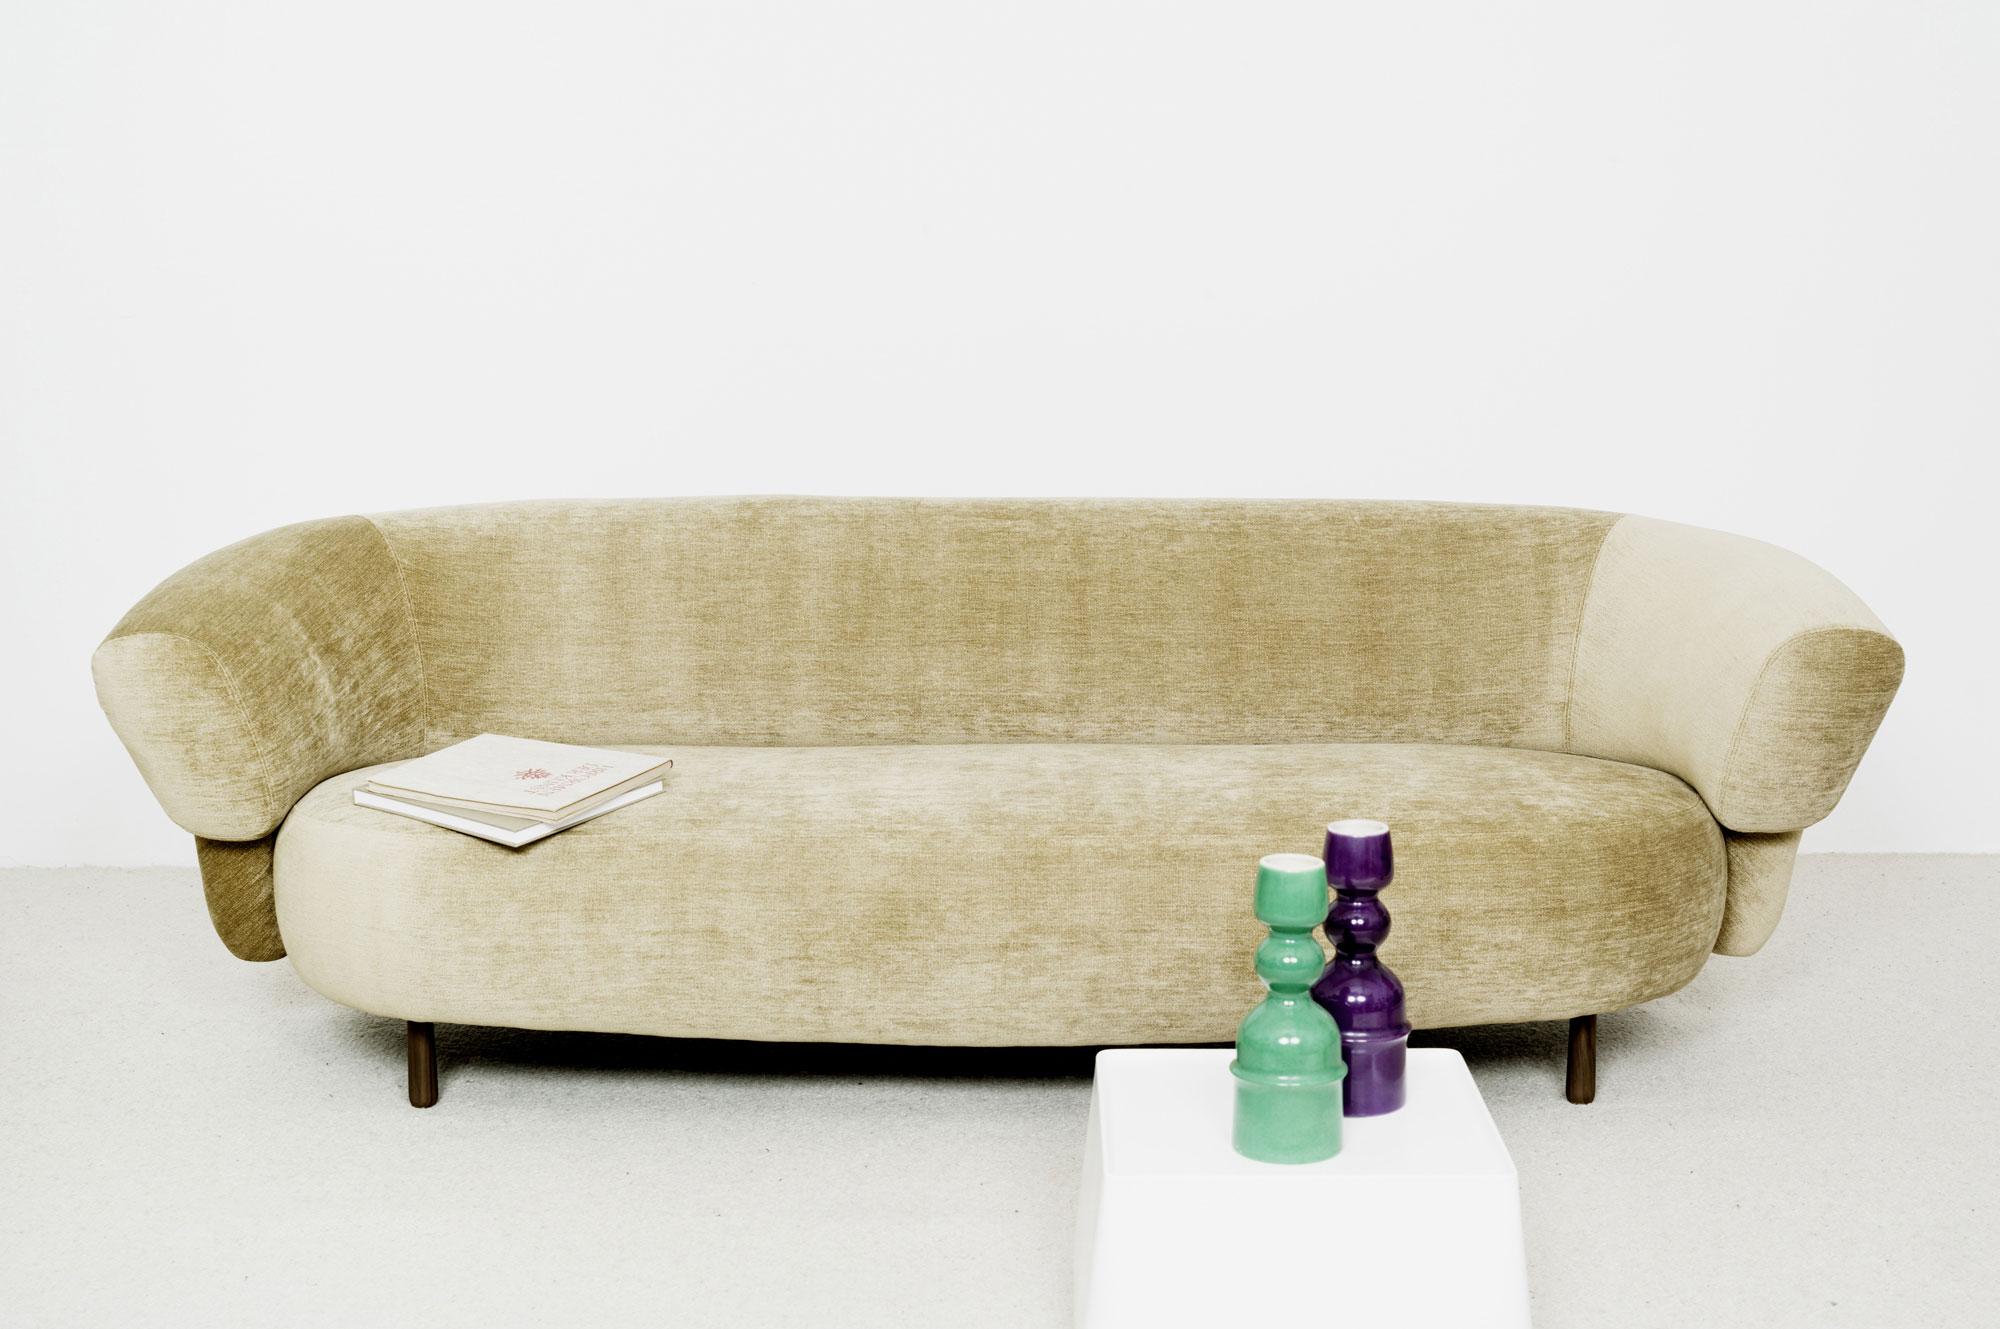 bob sofa christophe delcourt simmons panama sleeper canape ana